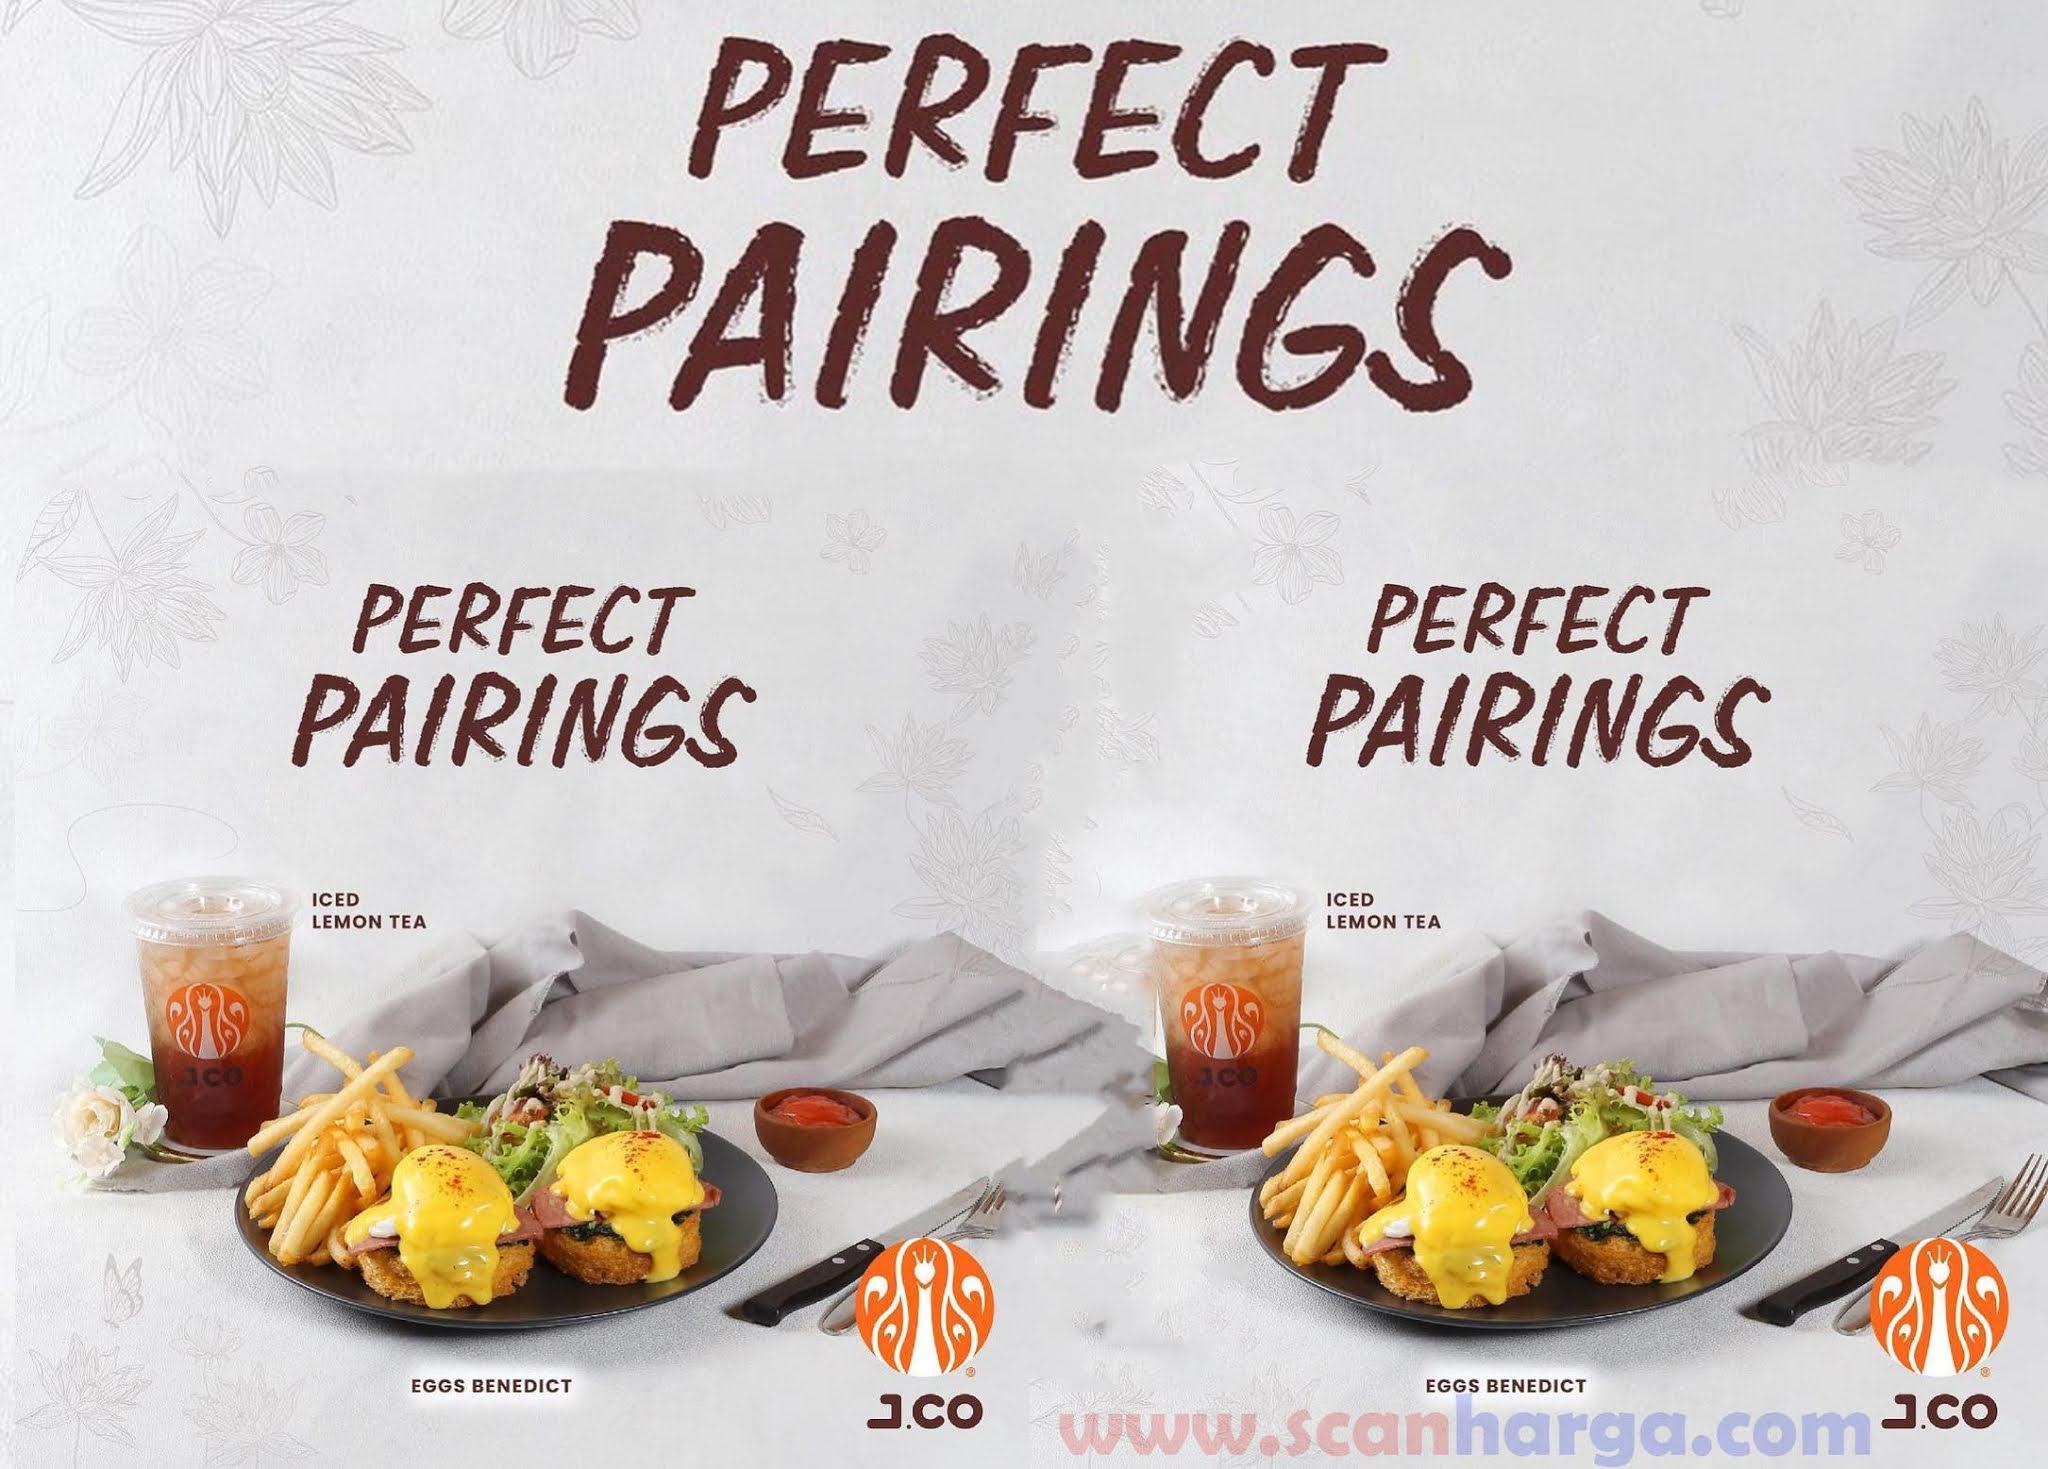 Promo JCO Perfect Pairing - Gratis Iced Lemon tea  Iced Americano